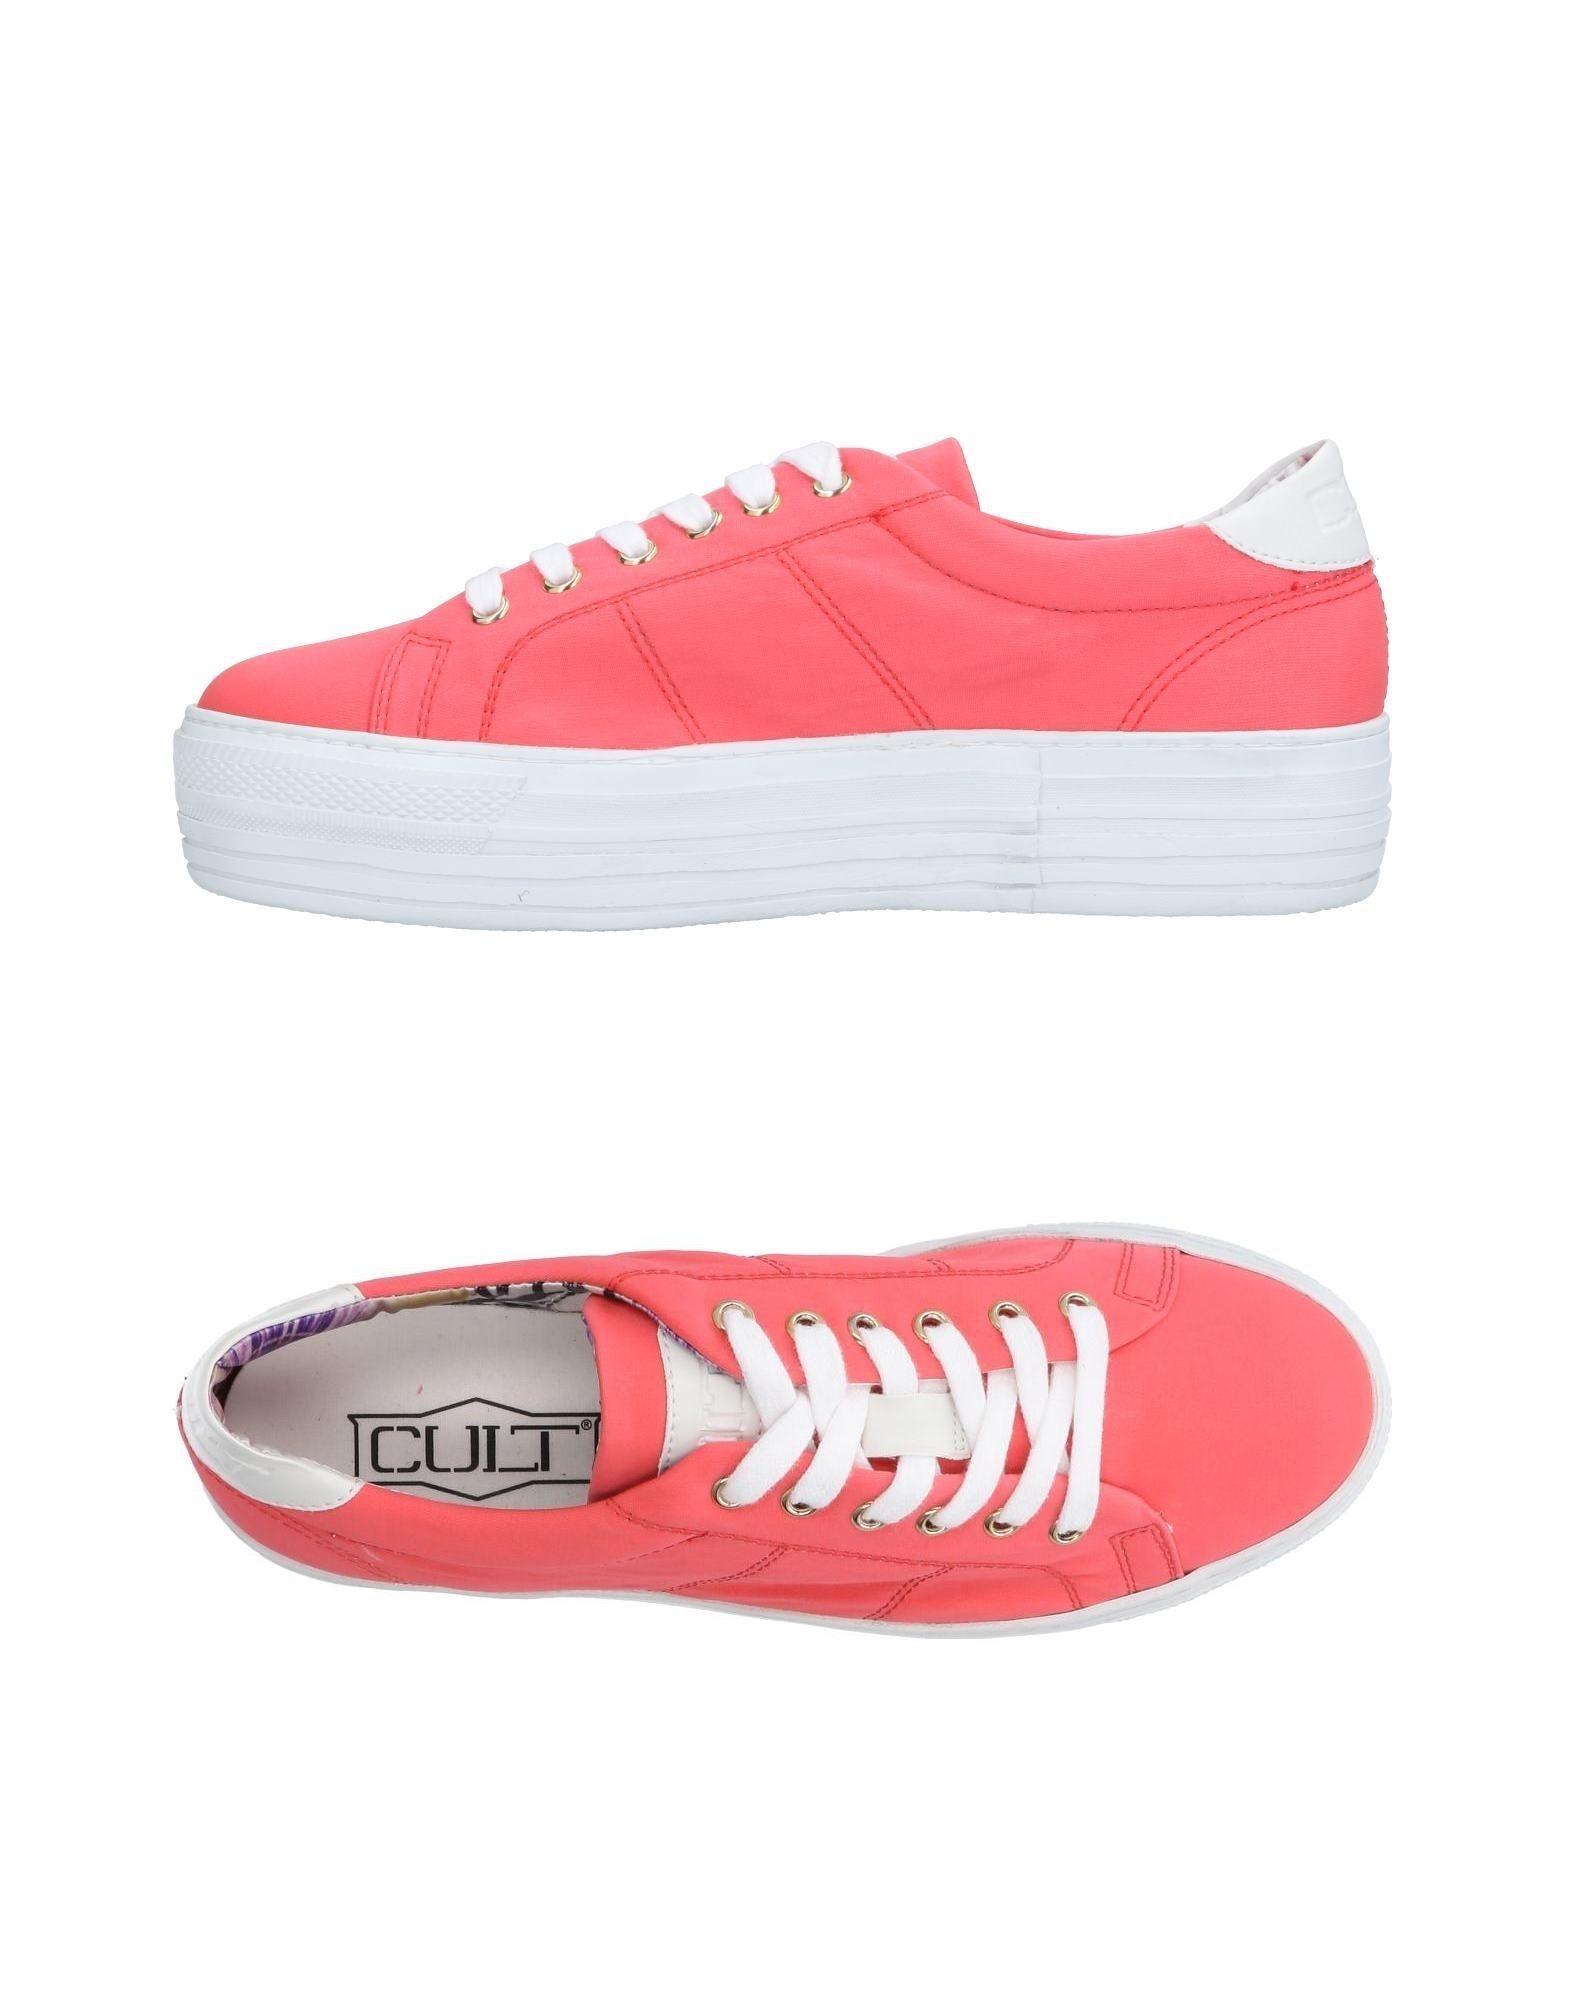 Cult Sneakers Damen  11498344MJ 11498344MJ 11498344MJ 2ba255